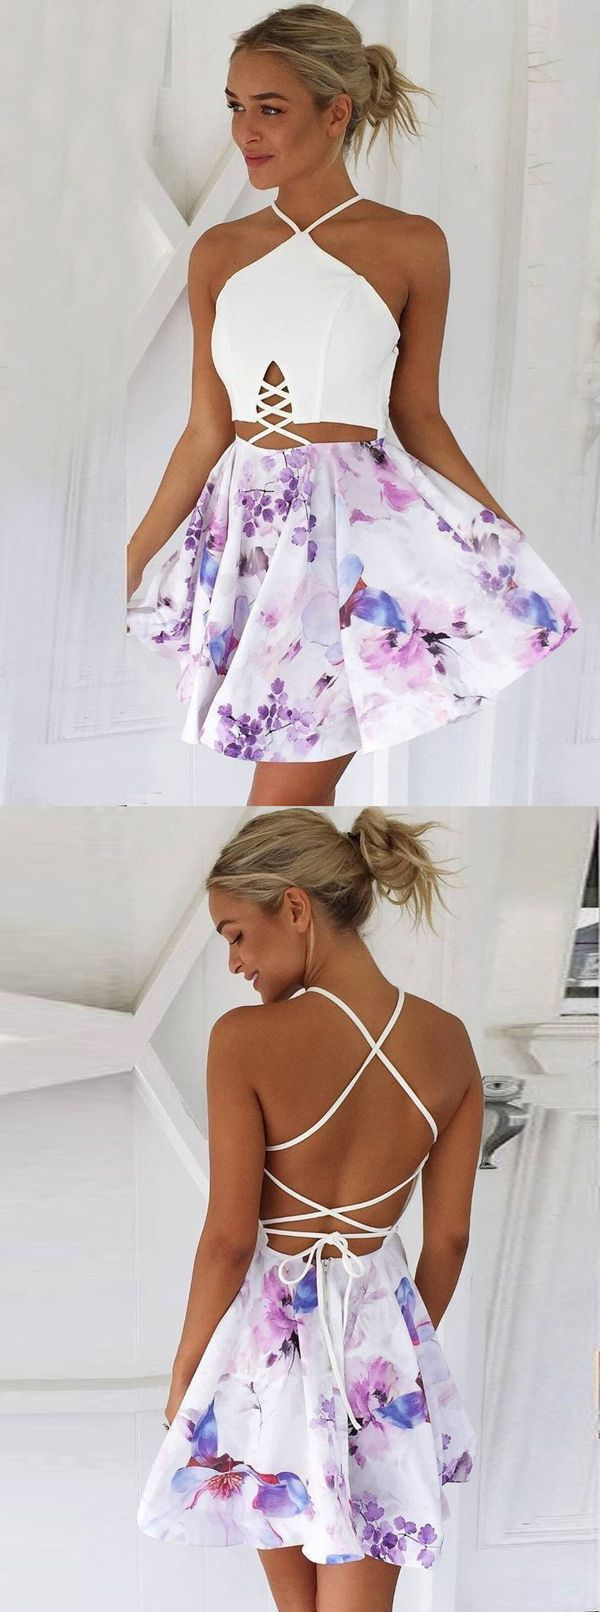 floral homecoming dresses,short dresses,summer dress,homecoming dresses short